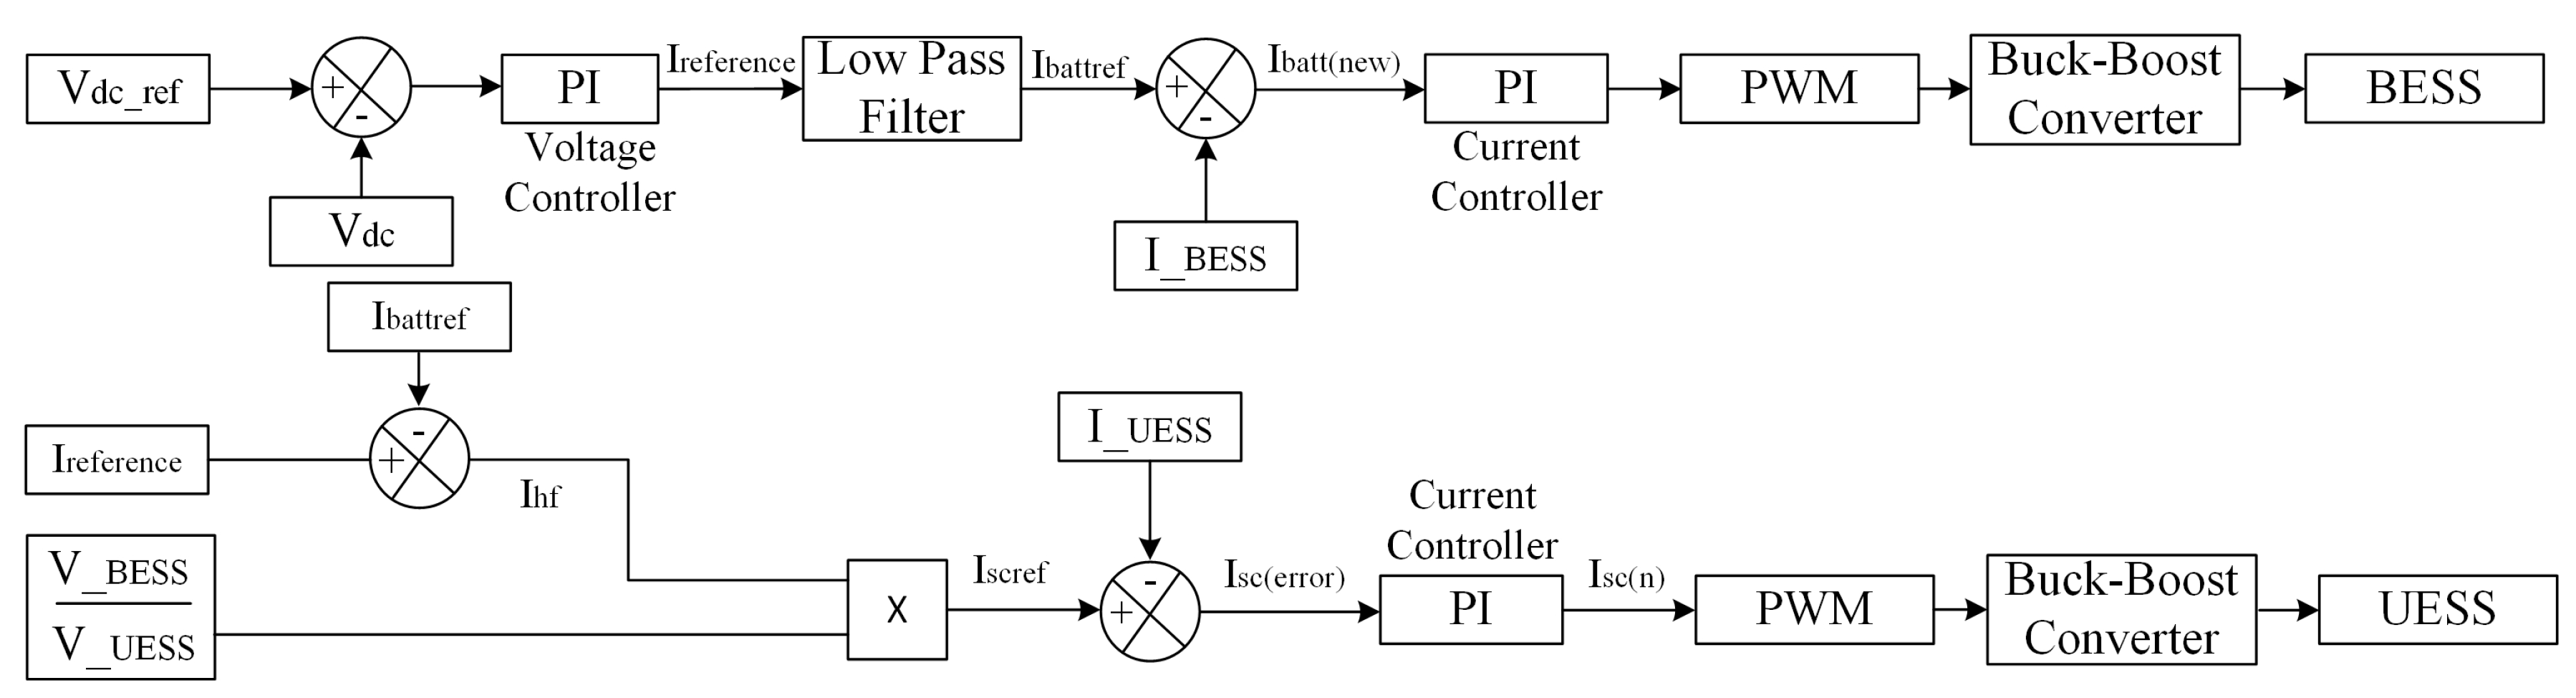 Energies | Free Full-Text | Control of Hybrid Diesel/PV